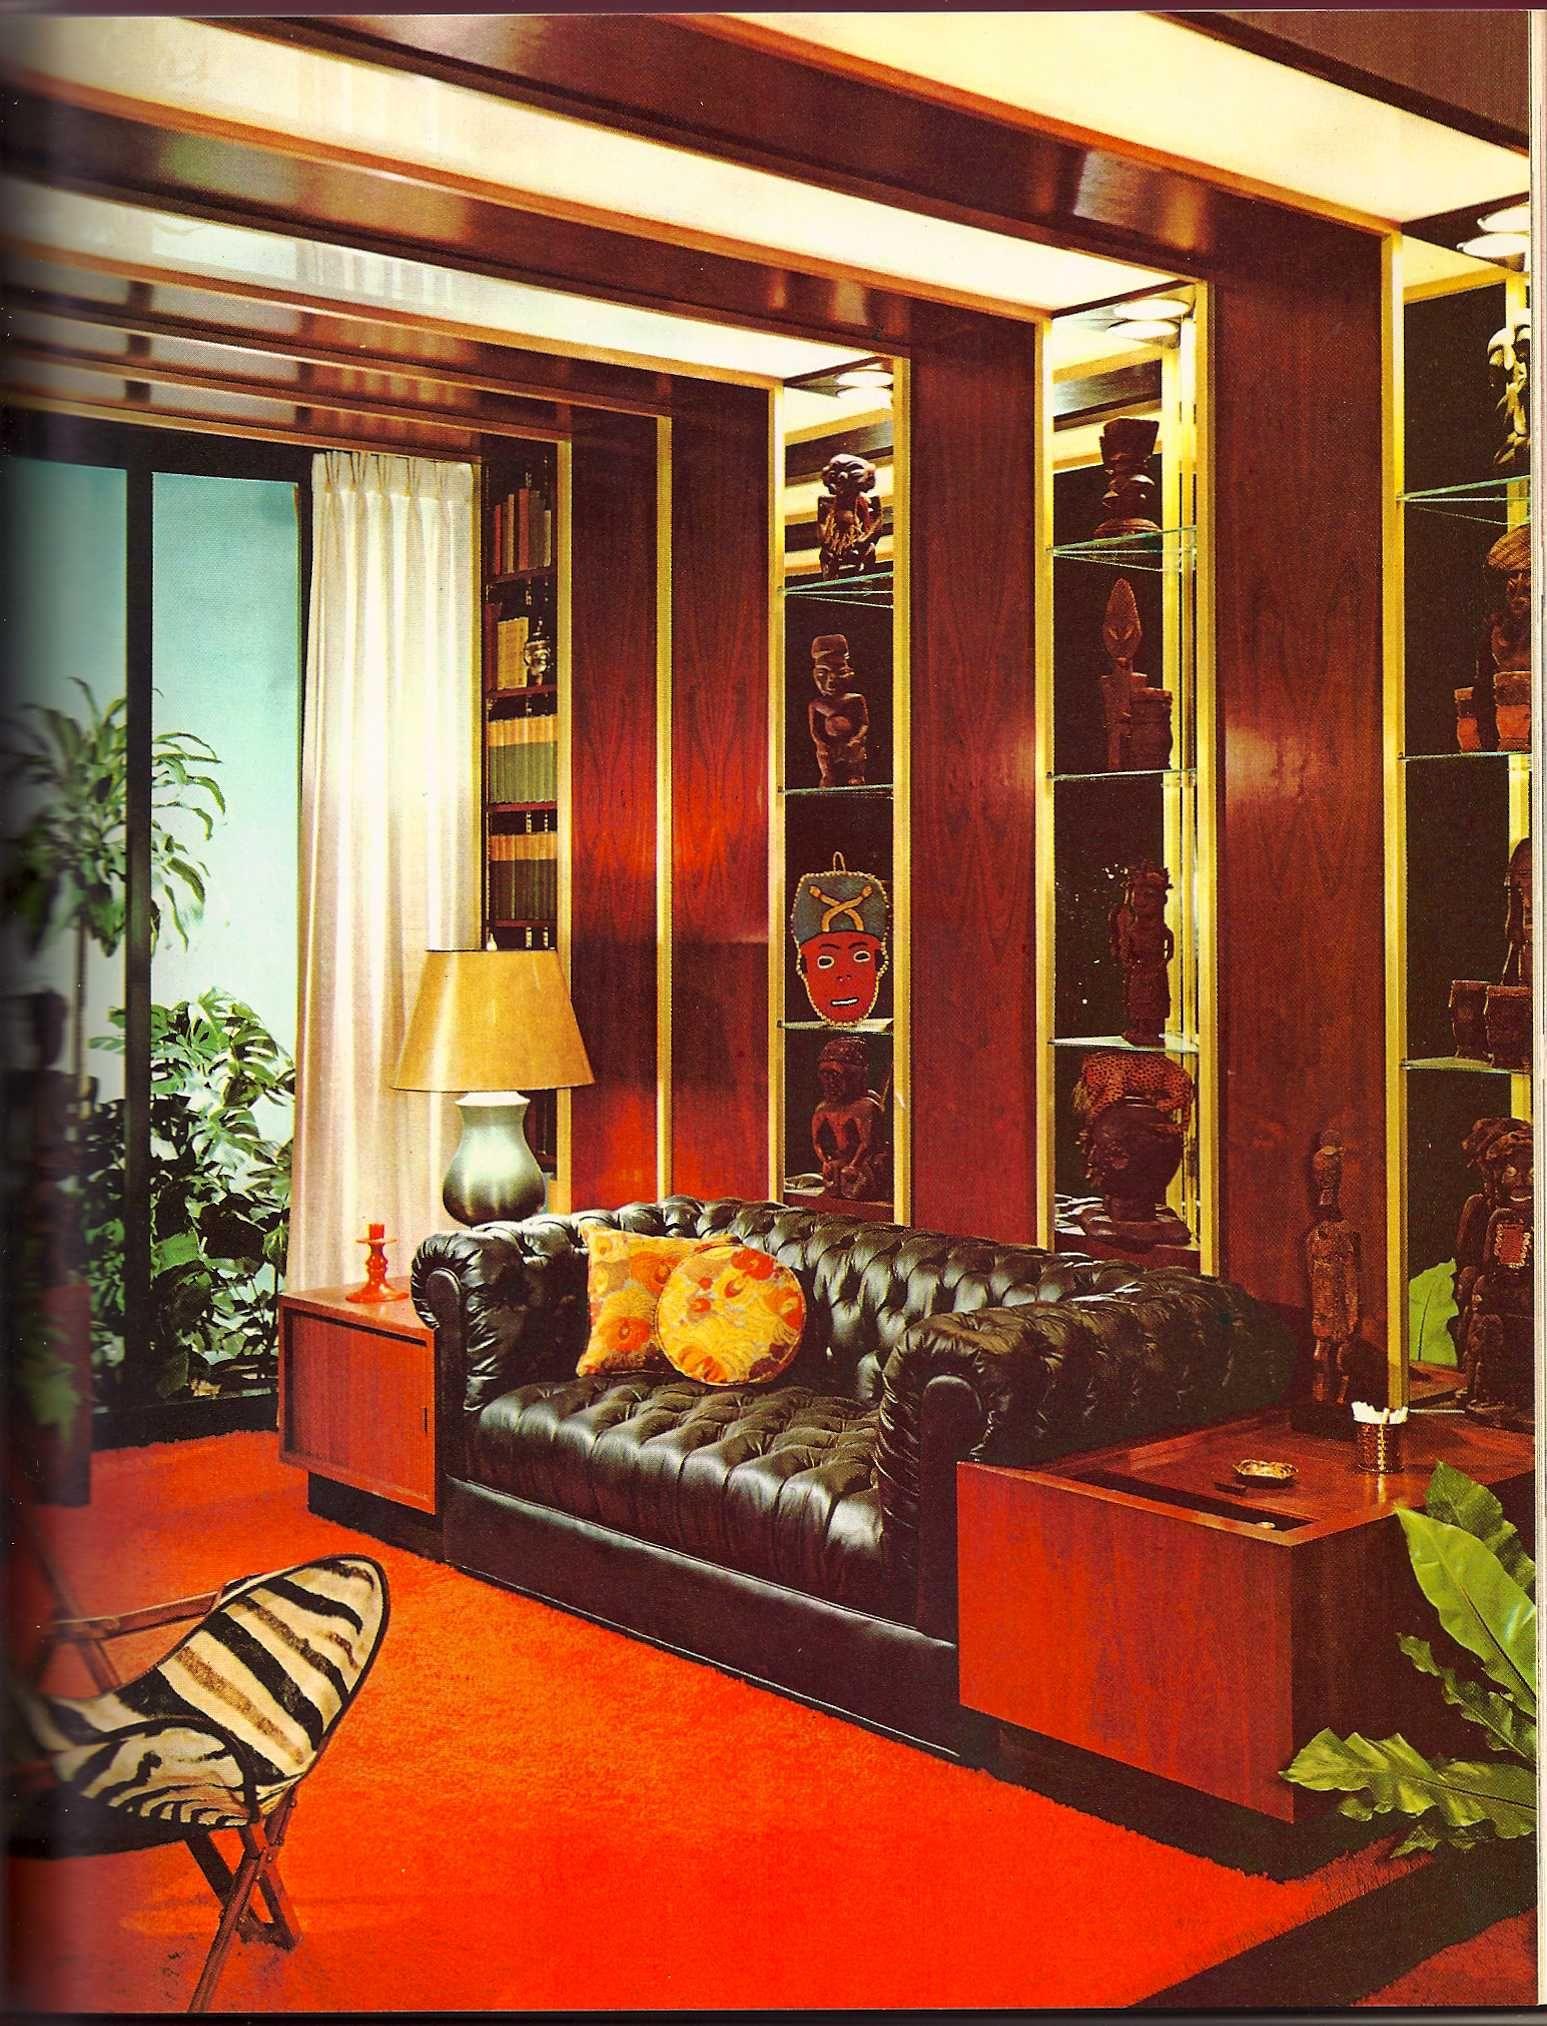 70's Interior Design Book5 Interior Design Books Interiors And Retro